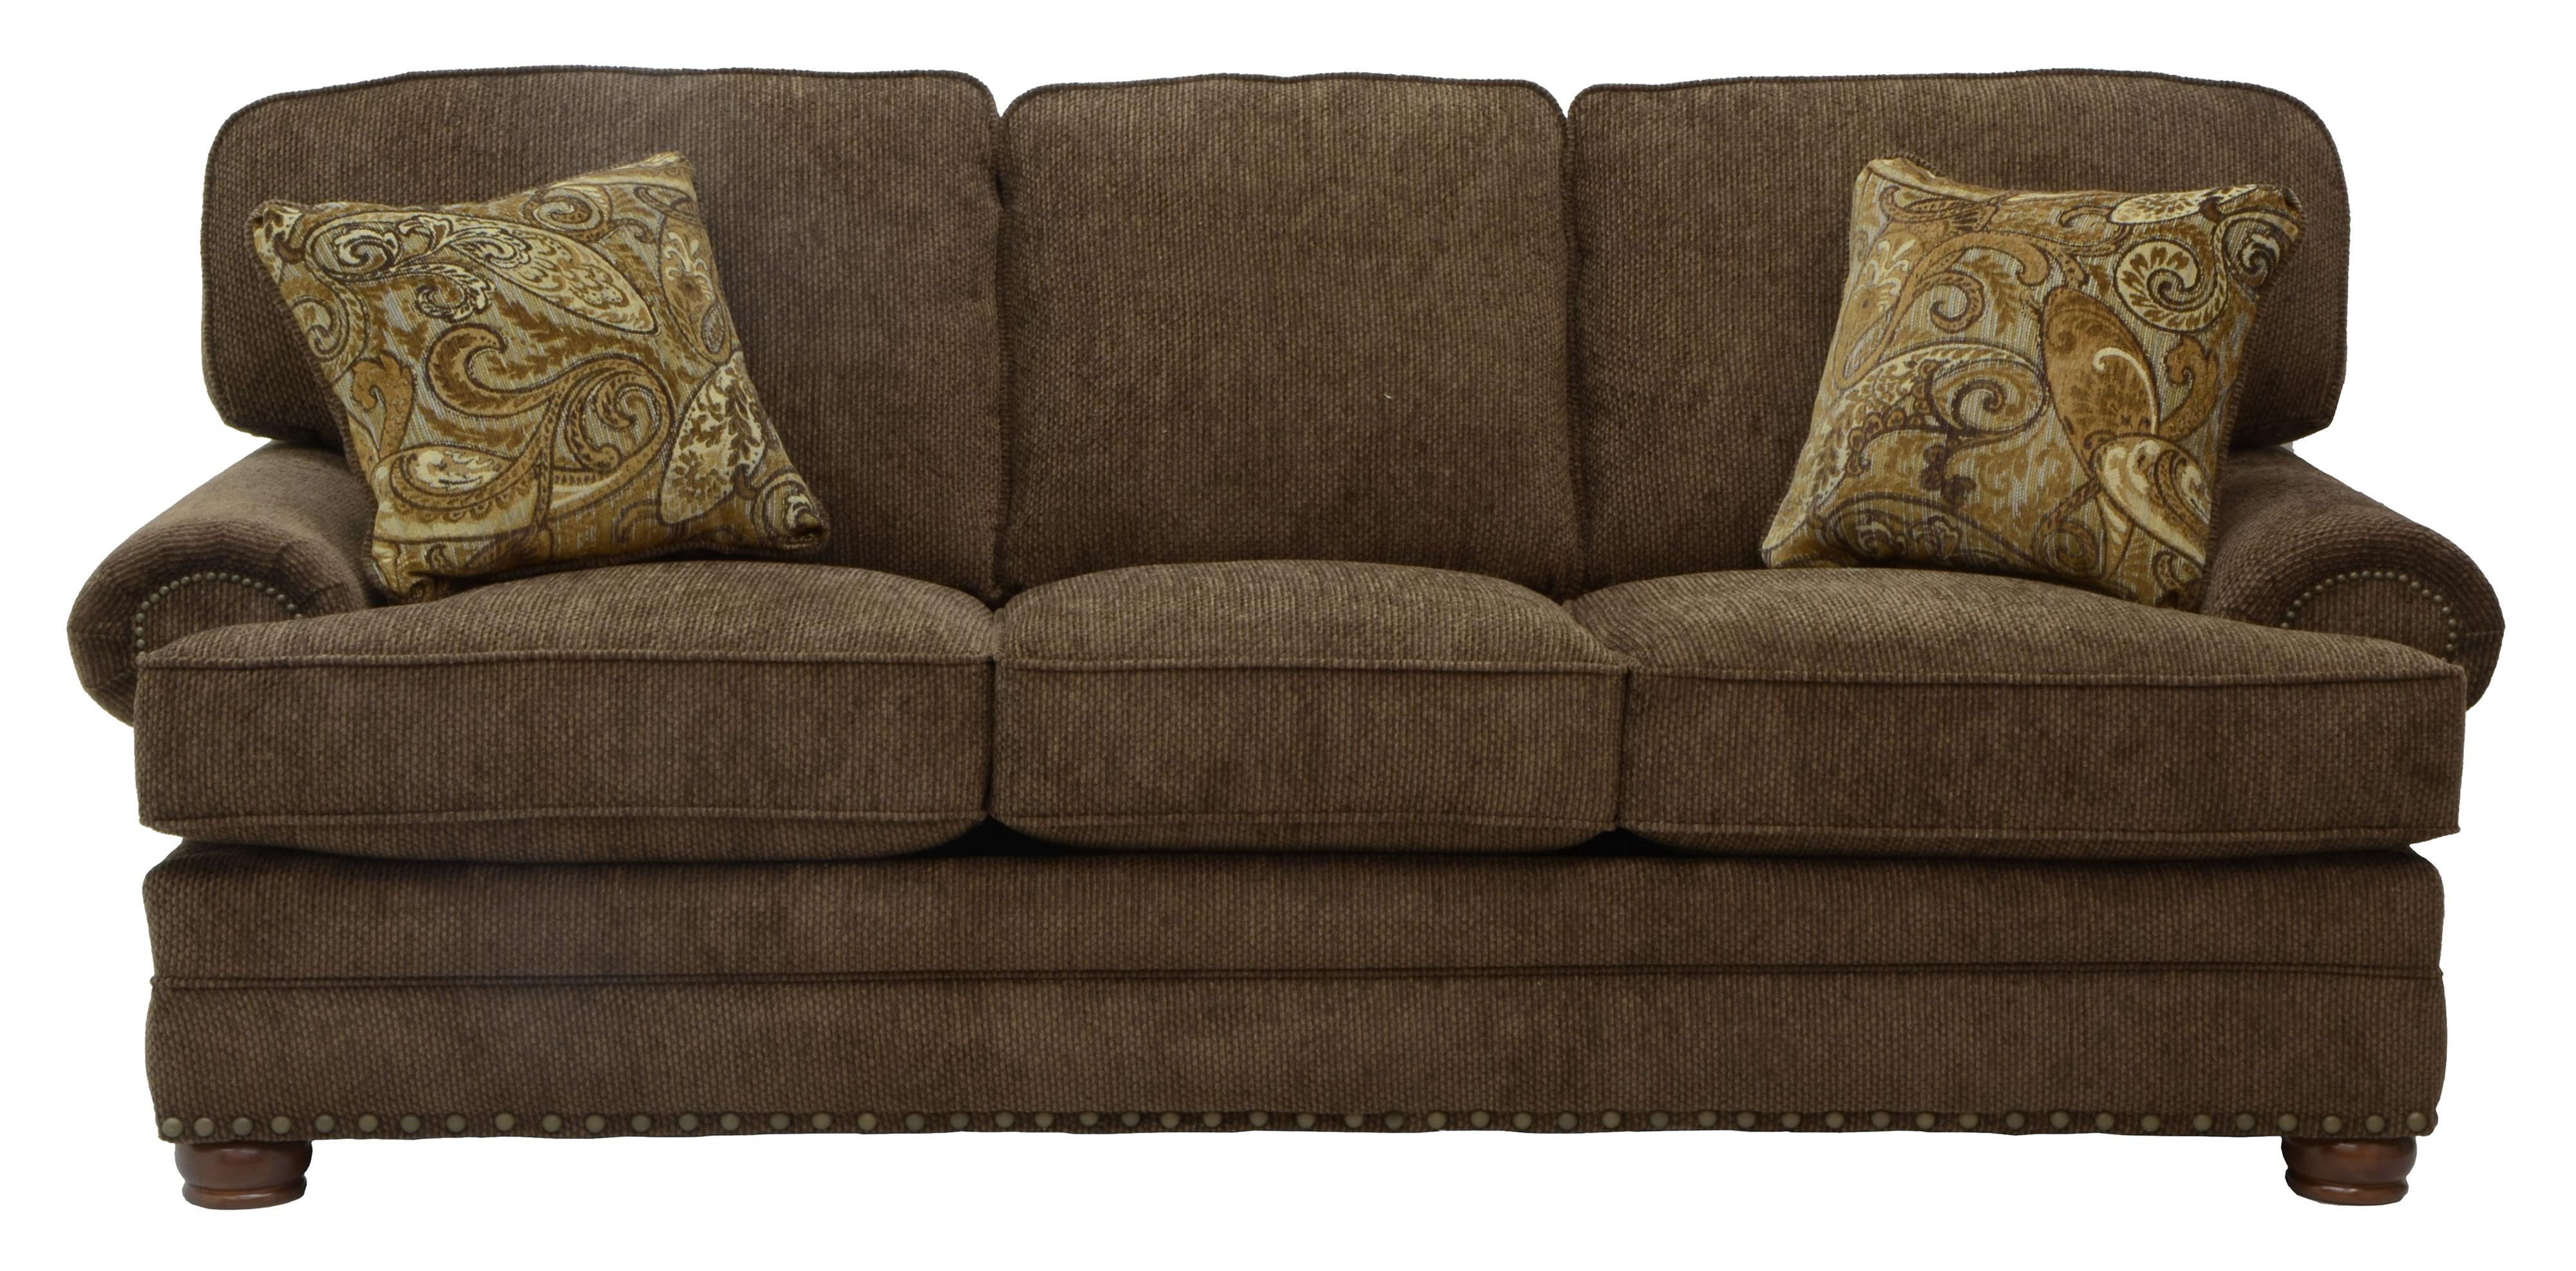 Jackson Furniture Braddock Sofa with Individually Driven